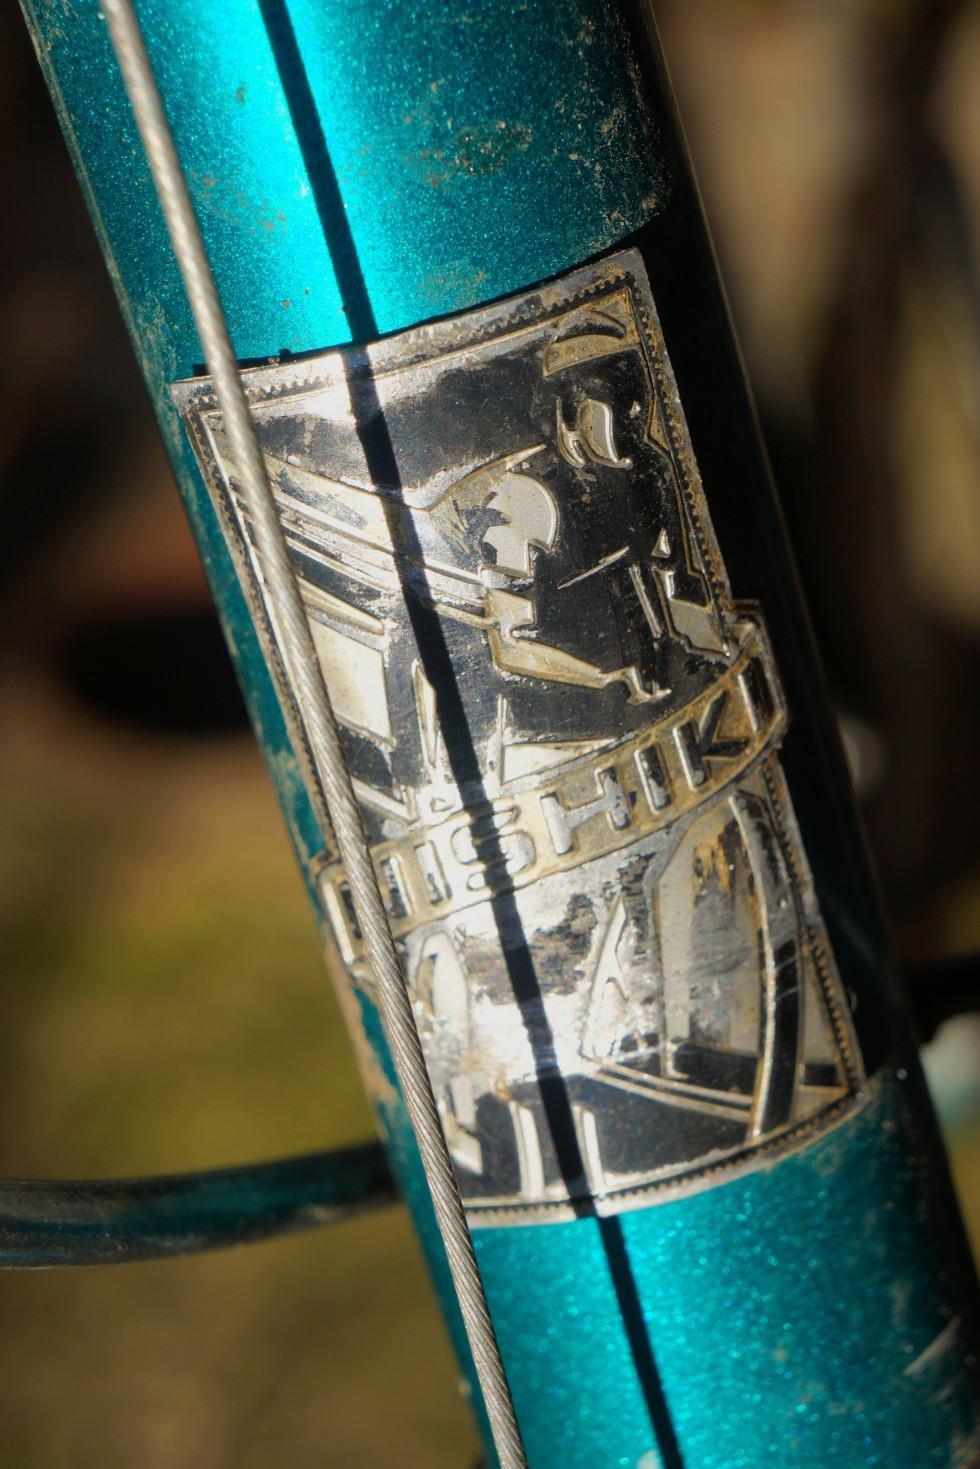 nis-frank-bike_hdbdg